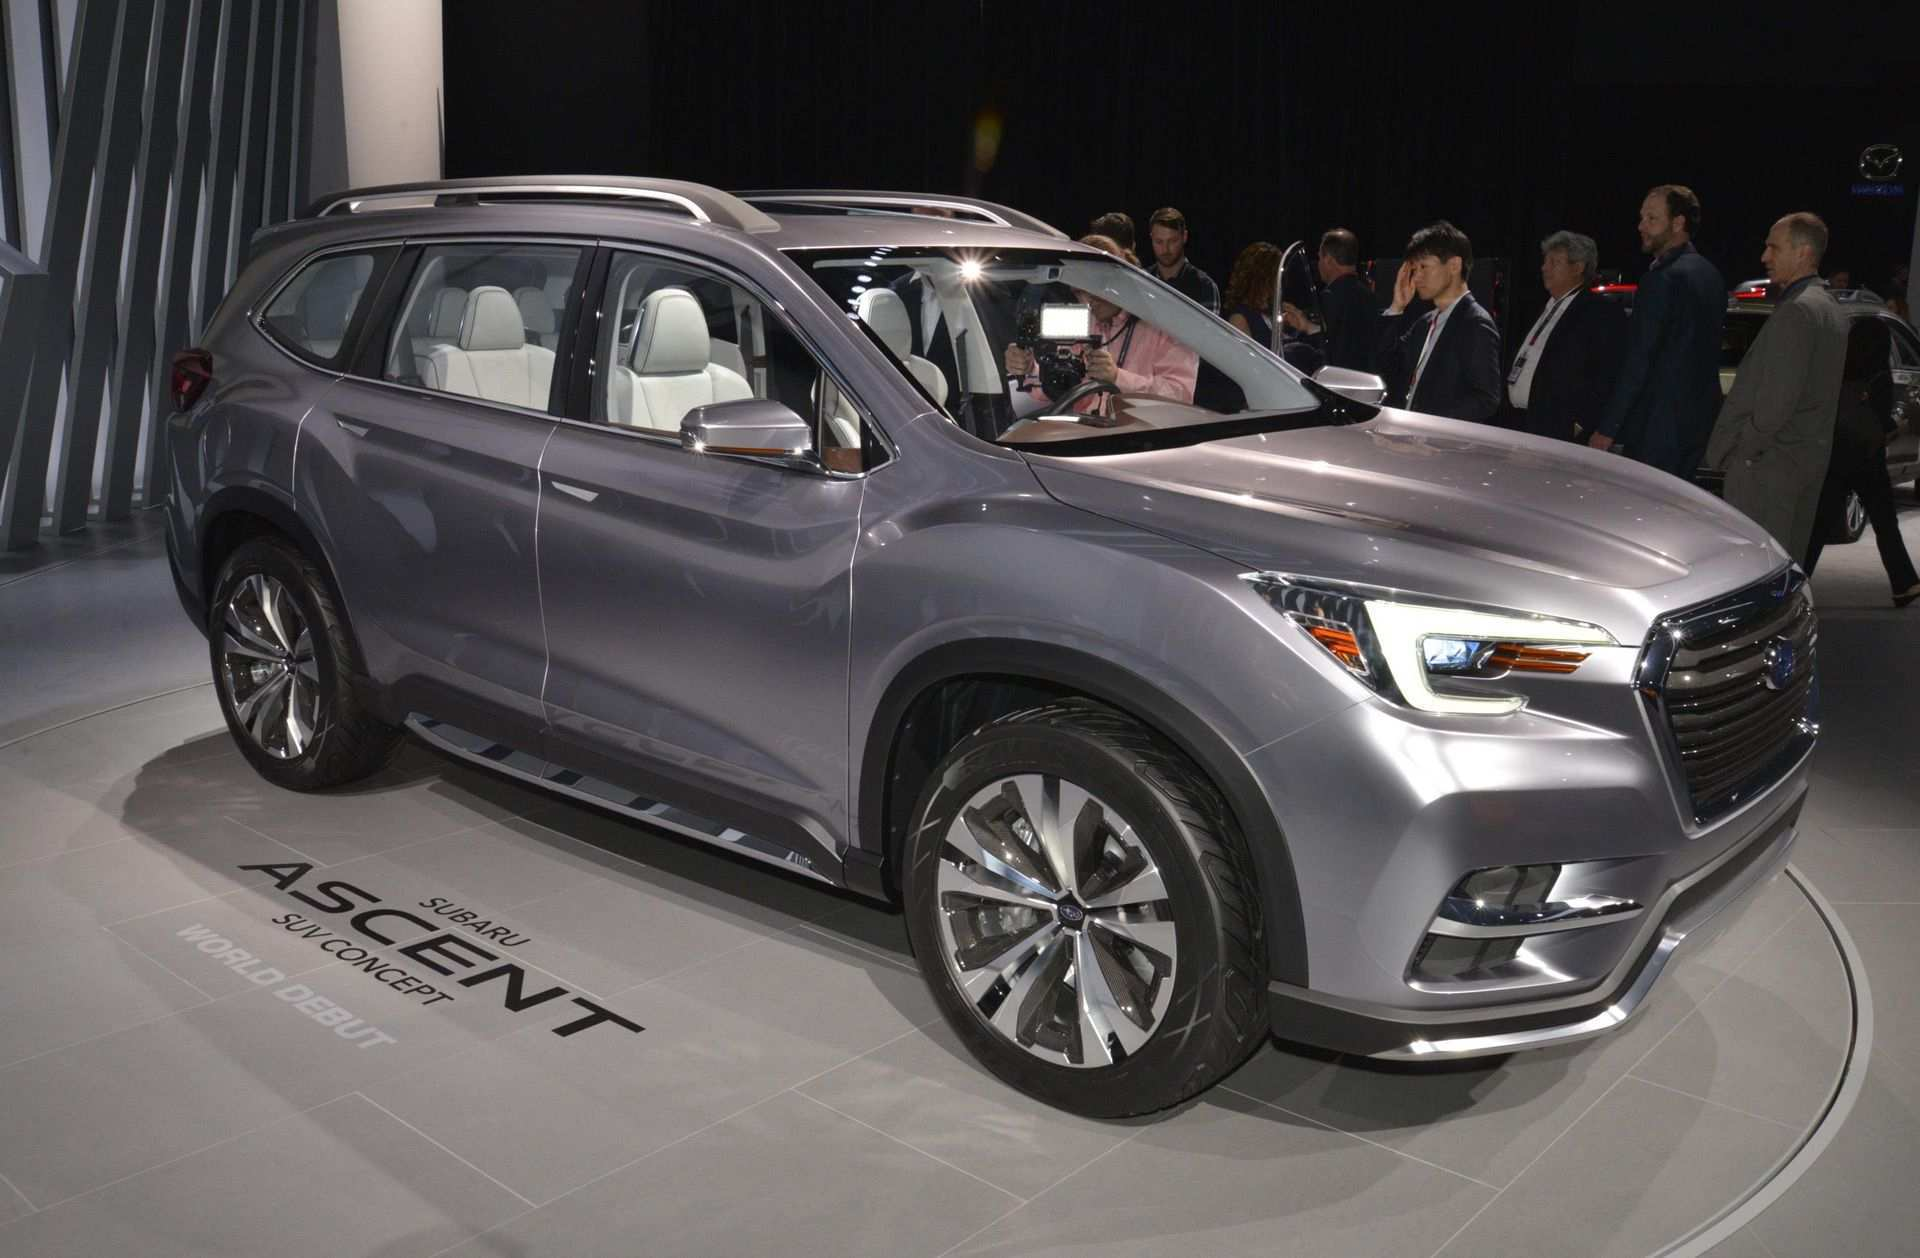 30 Gallery of Subaru 2020 Exterior Picture for Subaru 2020 Exterior